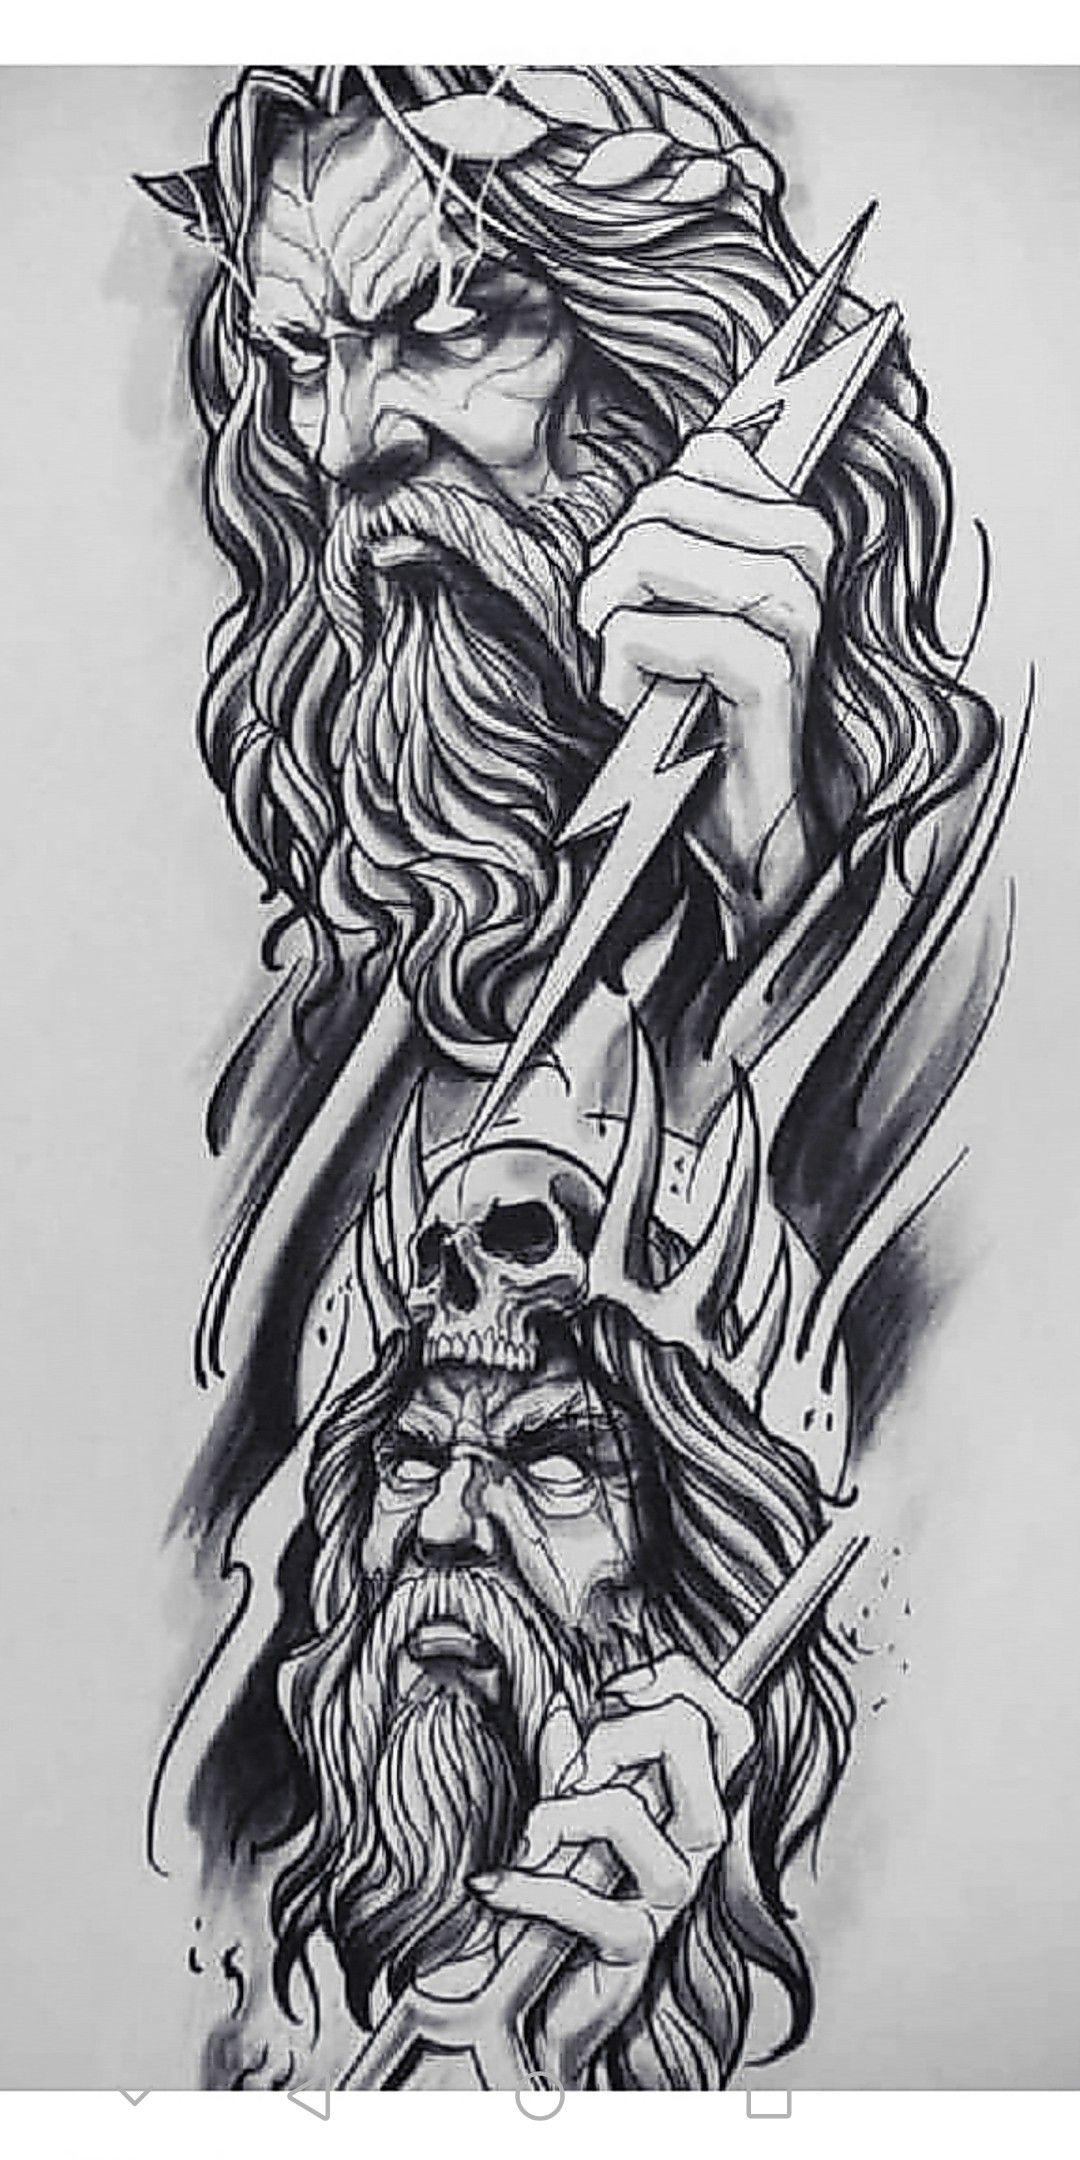 Pin De Nadeali Em Tattoo Tatuagens De Mitologia Tatuagem Da Mitologia Grega Tatuagem Deusa Grega